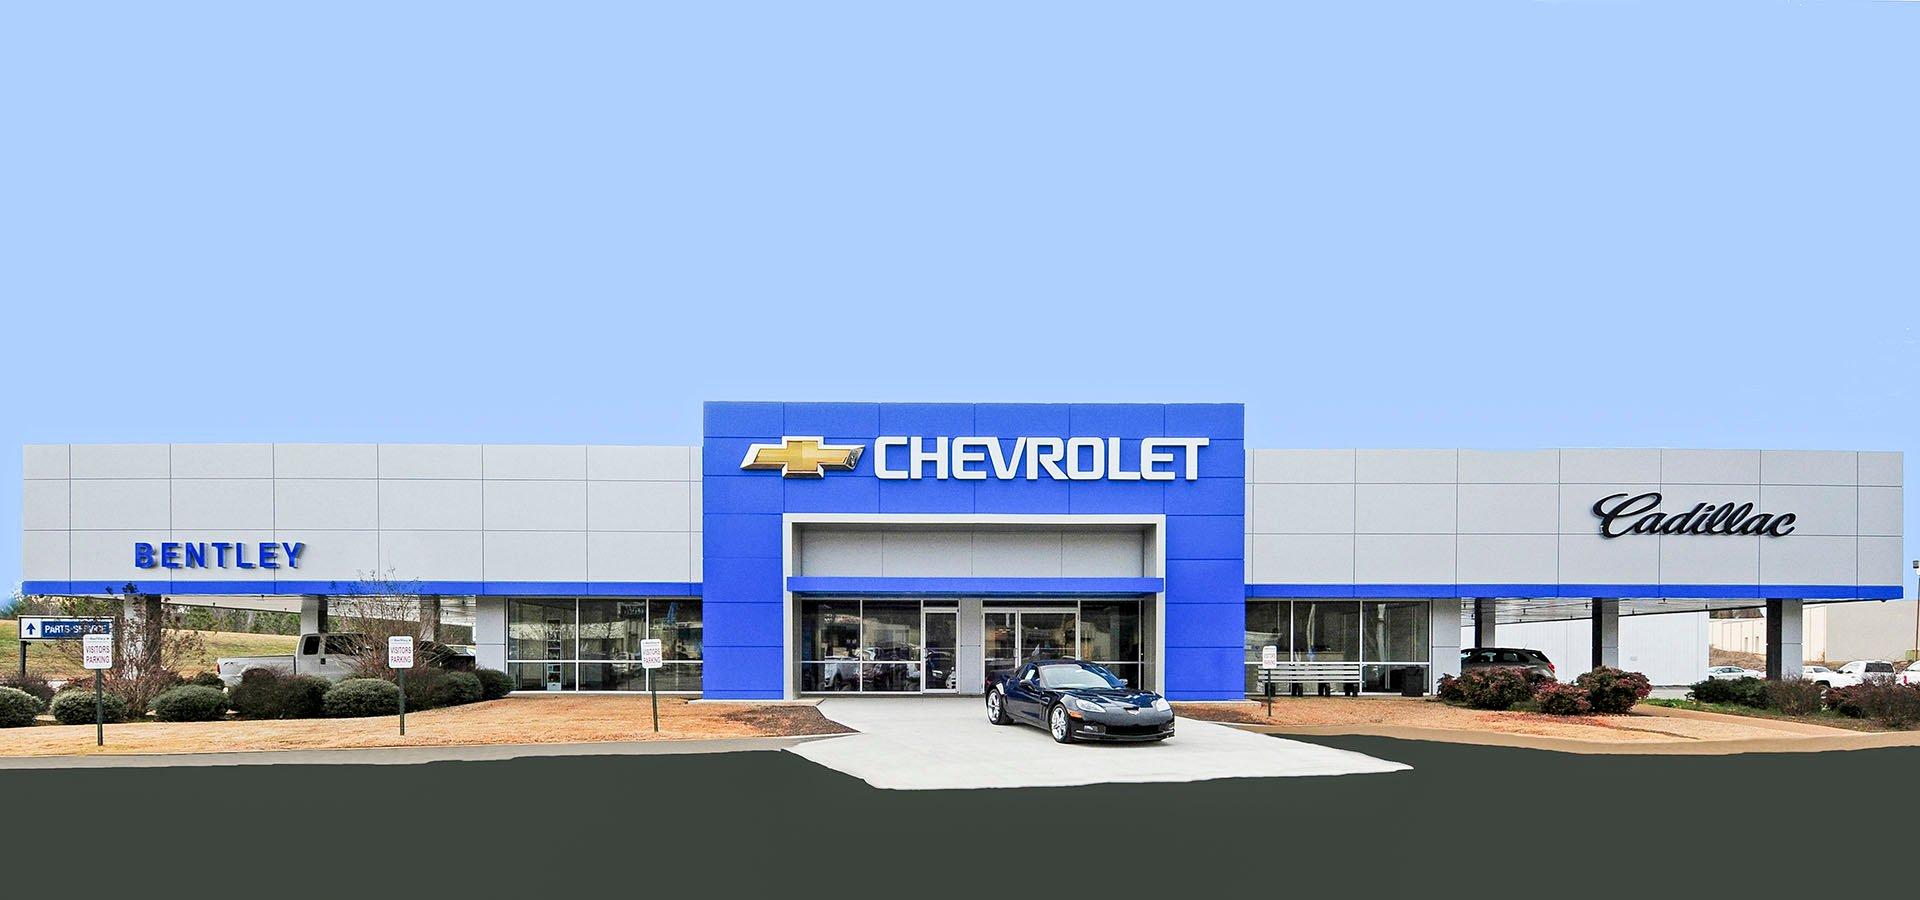 Bentley Chevrolet | Florence Alabama | Brindley Construction, LLC.